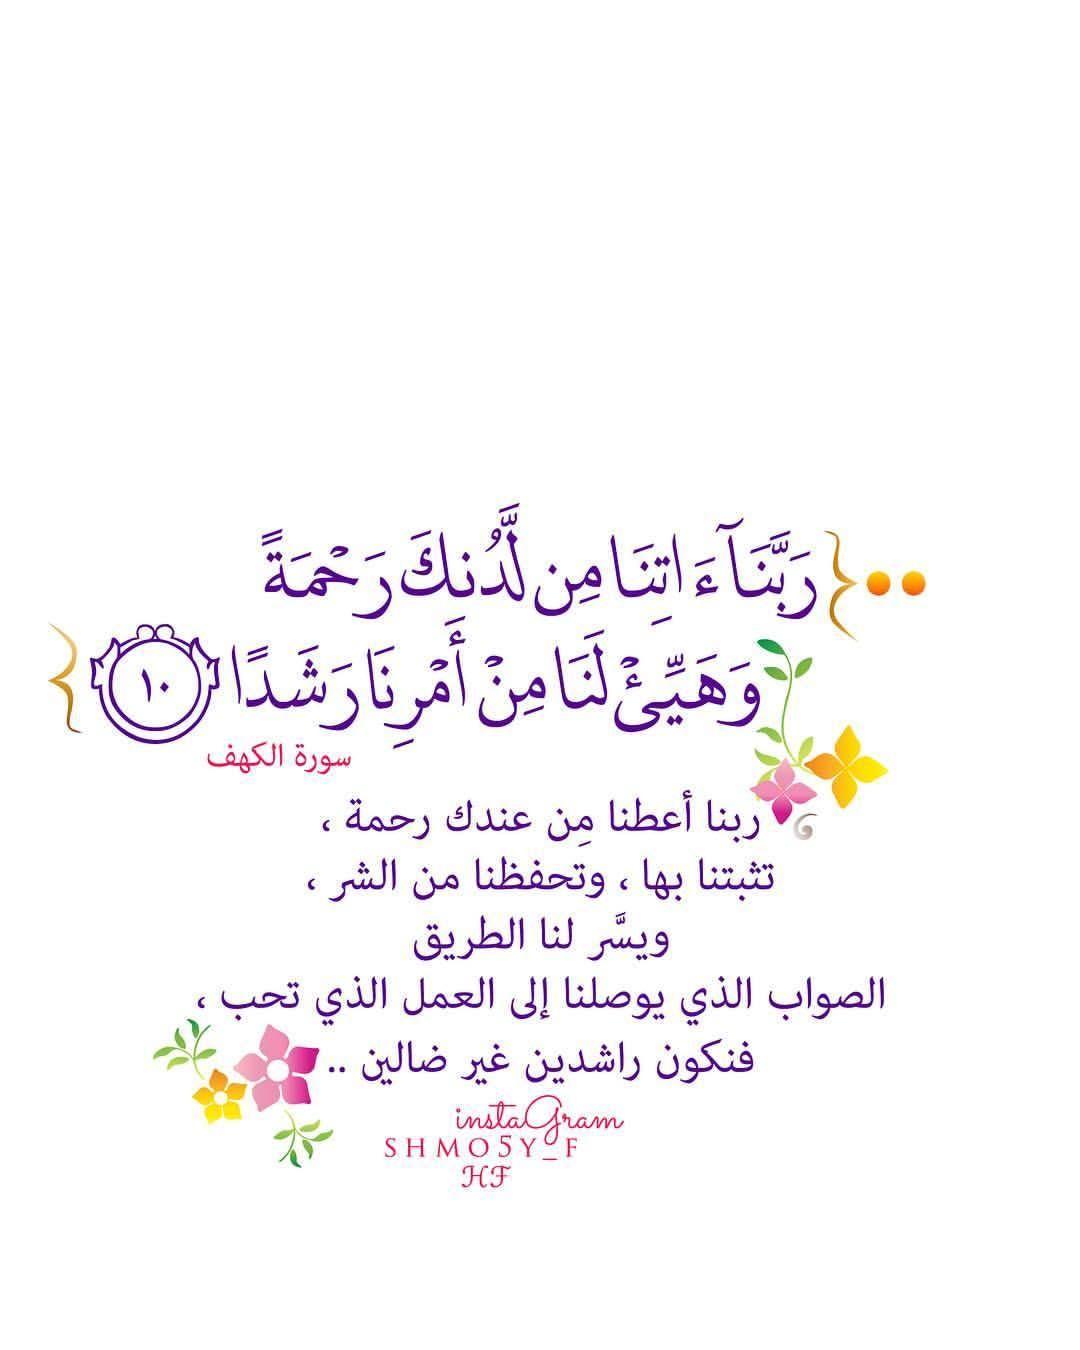 Shmo5yf Instagram Islam Muslim Allah رمزيات غرد بصورة دين استغفار الو Ramadan Crafts Islamic Art Pattern Love Quotes Wallpaper